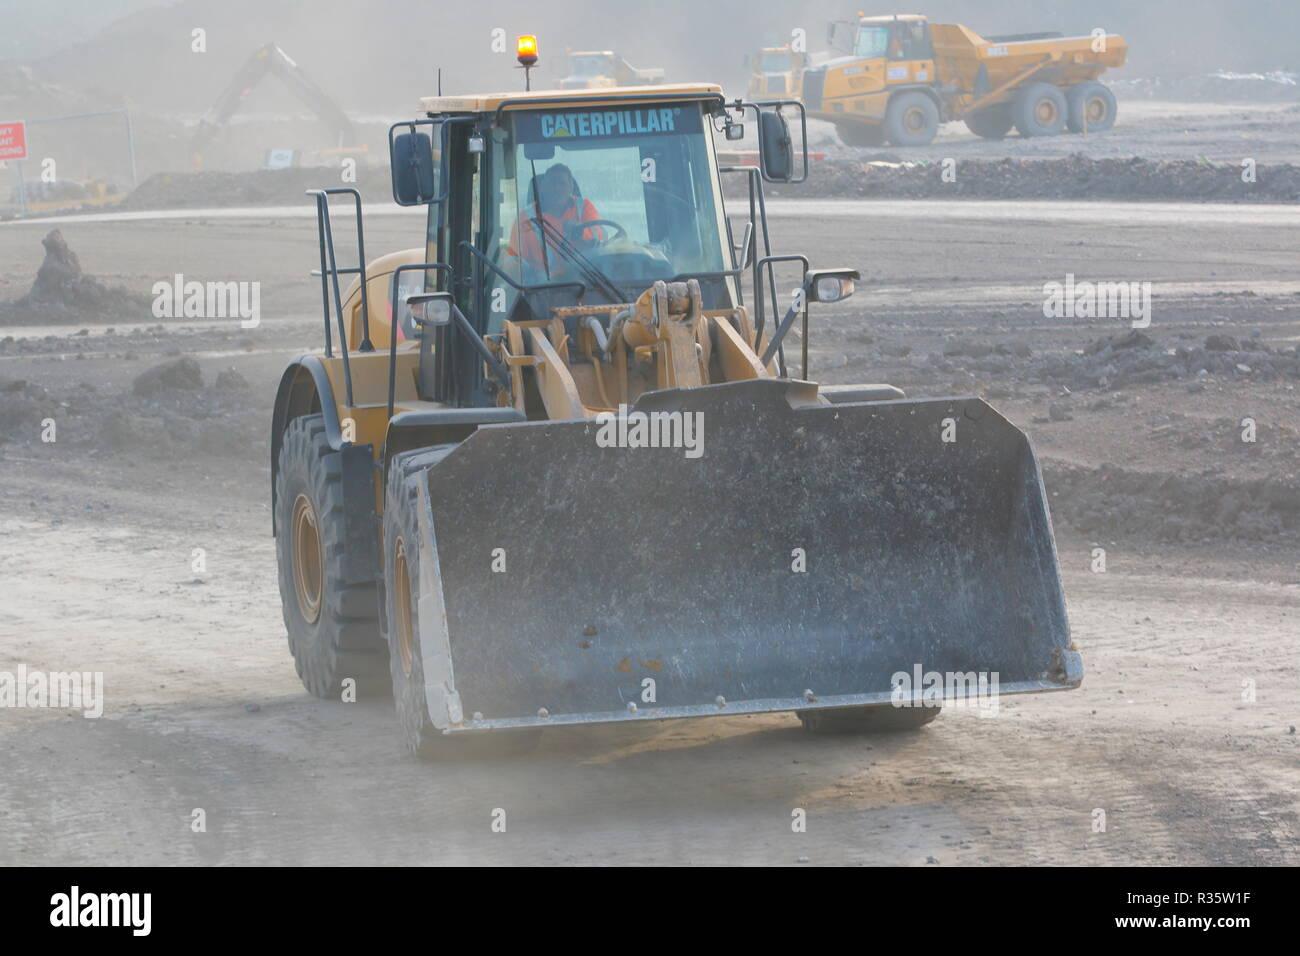 Cat Loading Shovel Stock Photos & Cat Loading Shovel Stock Images